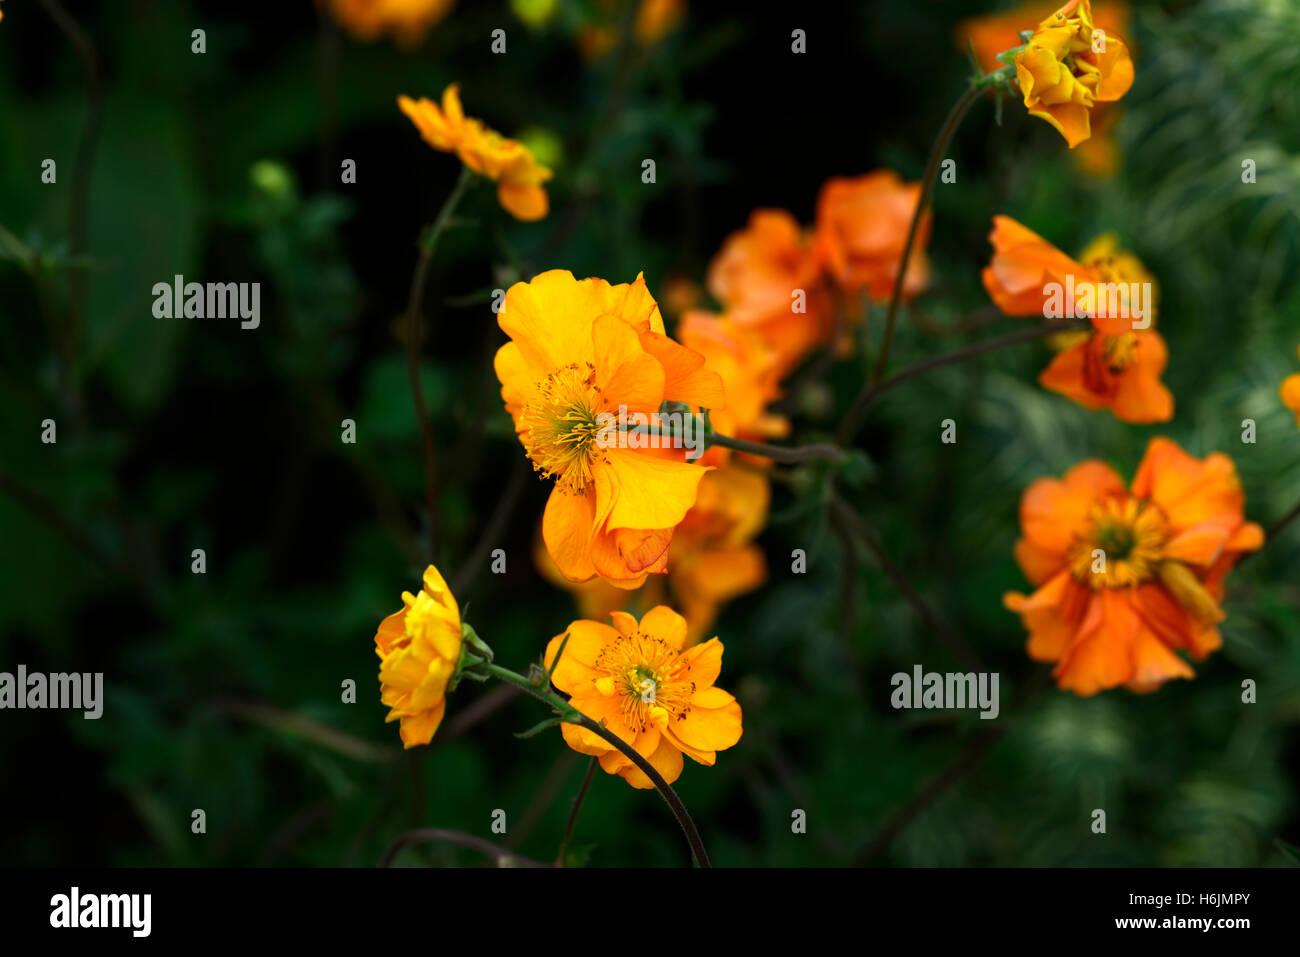 Geum Firestorm Avens Orange Geums Flowers Flower Flowering Perennial